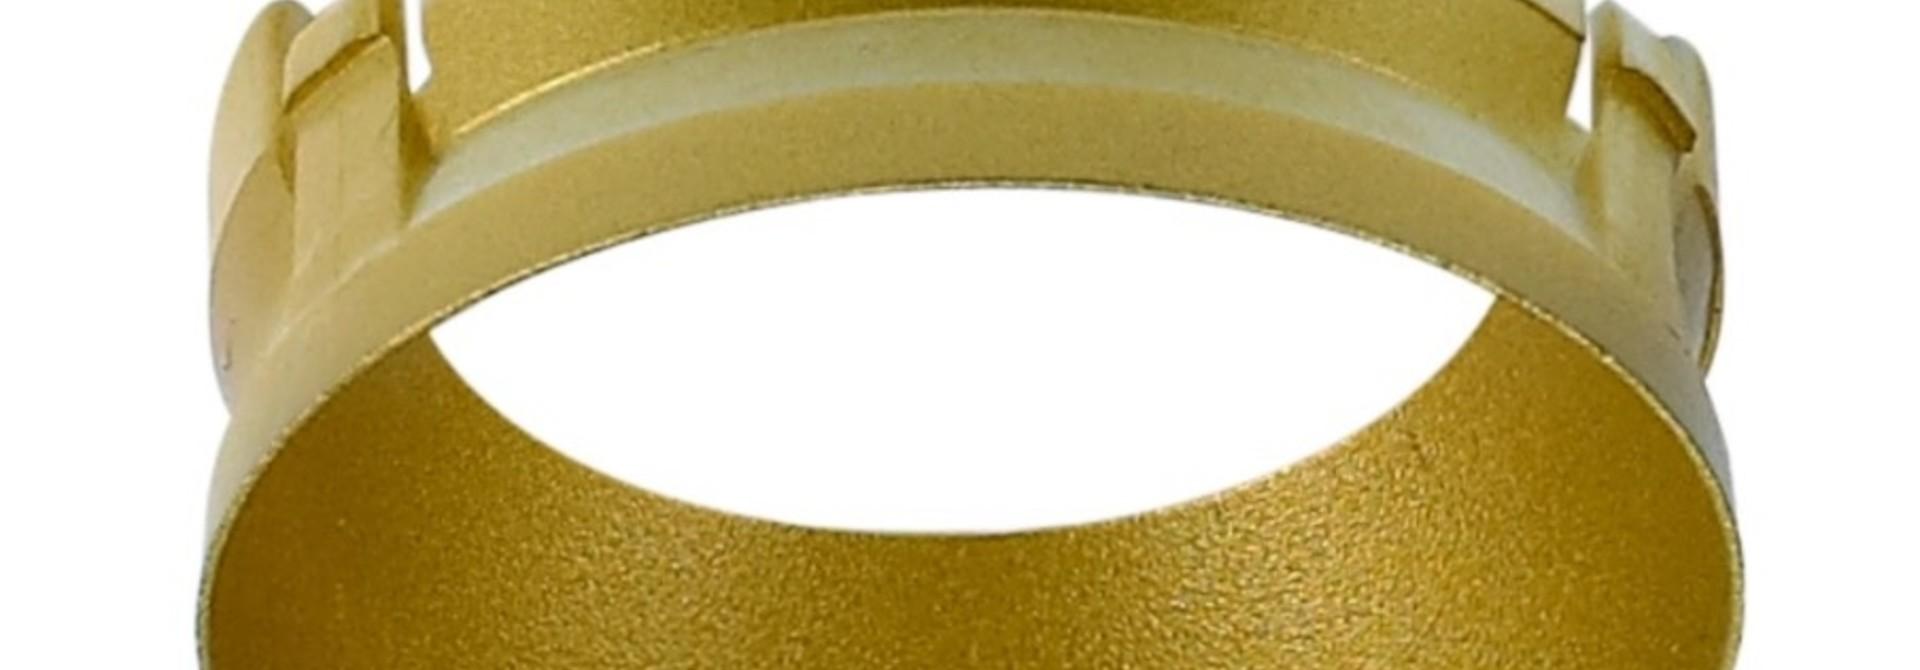 Anti-glare Ring Billy 3F Gold